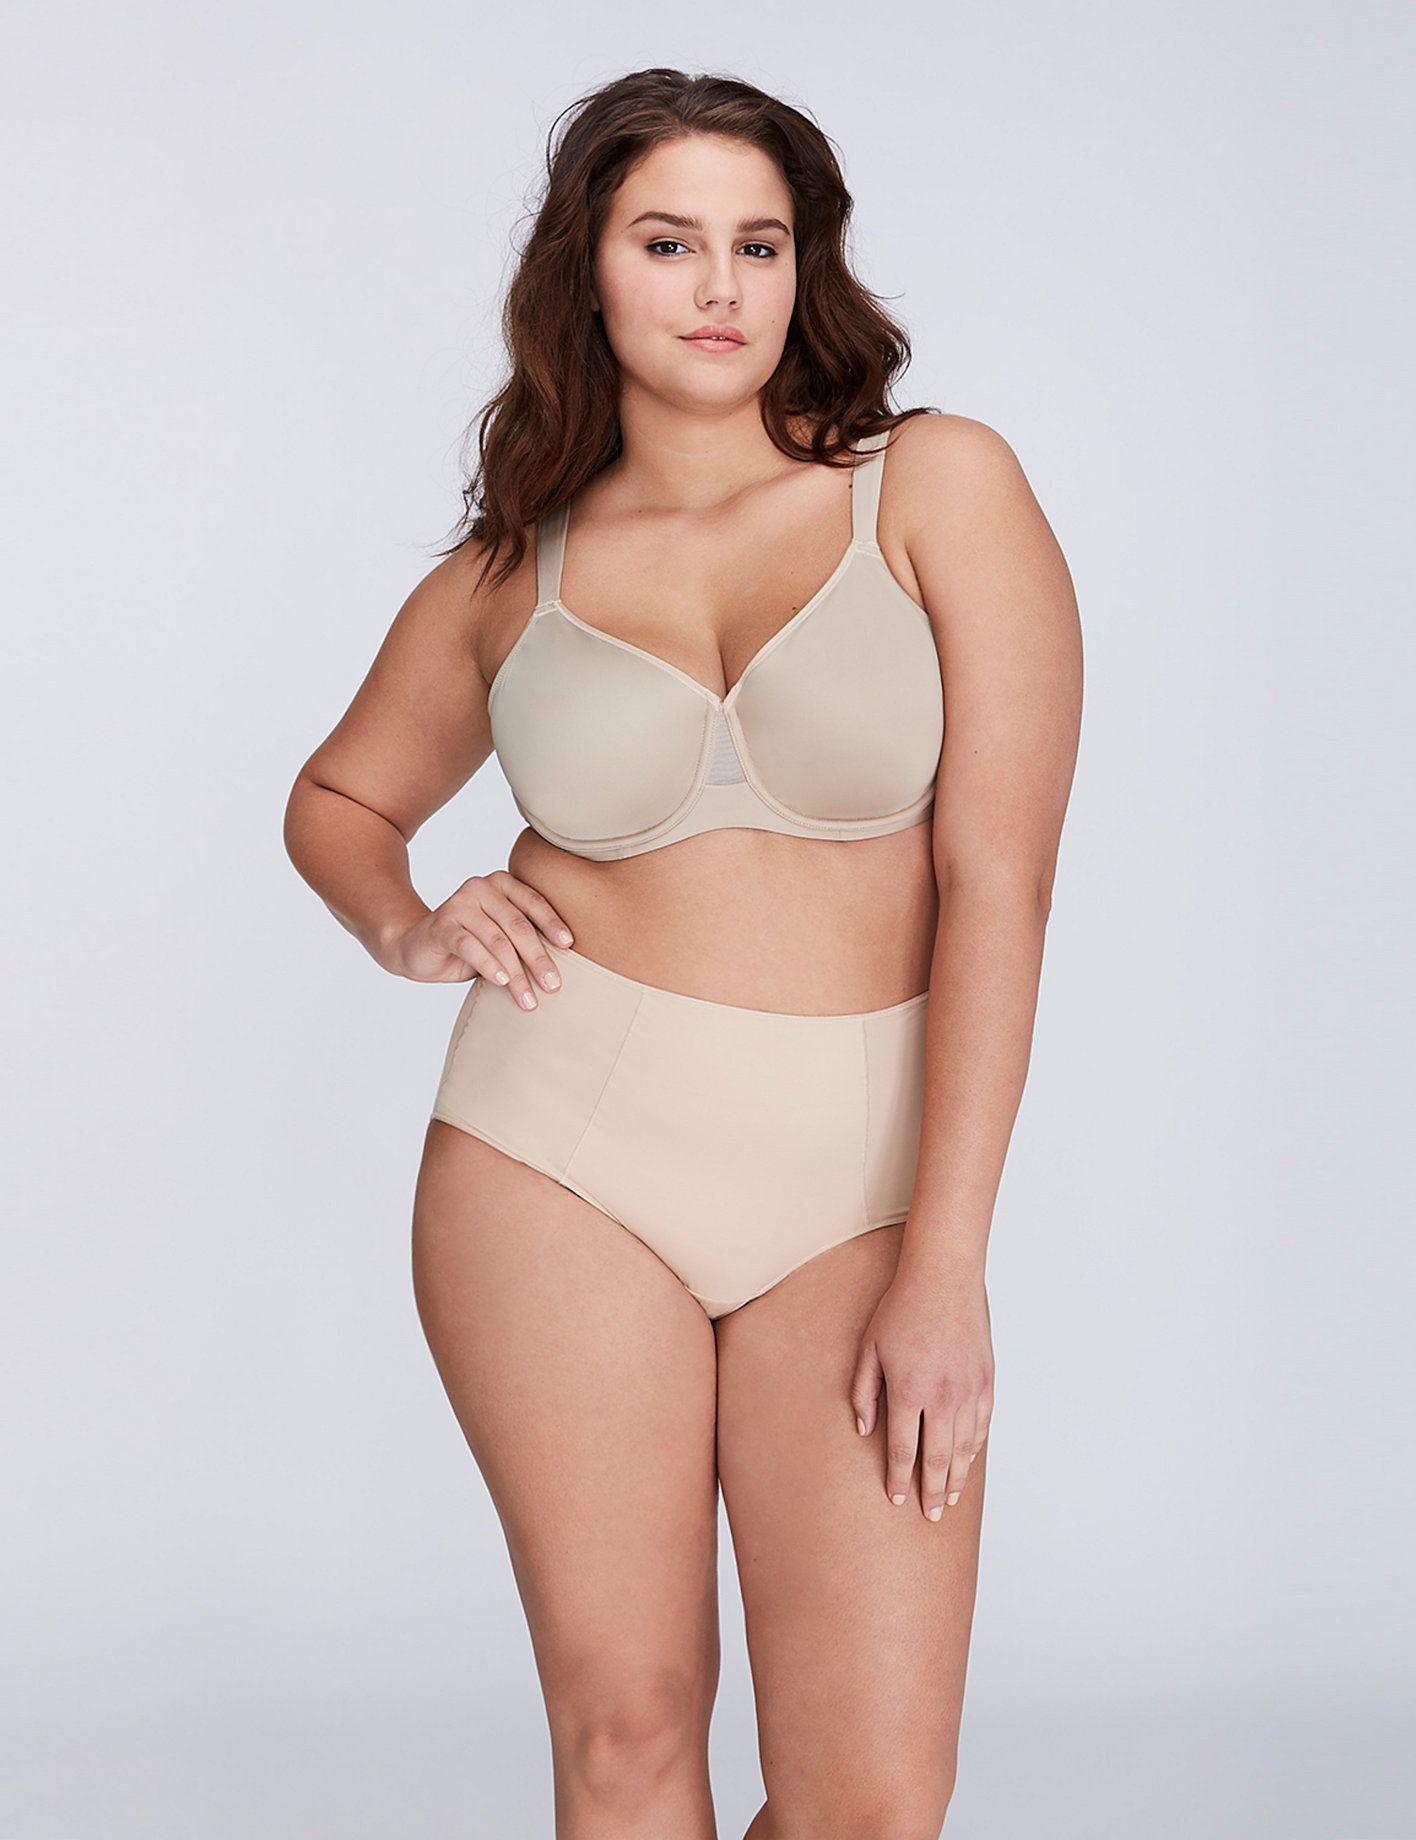 Plus Size Lingerie & Cacique Intimates | Lane Bryant | My lingerie ...